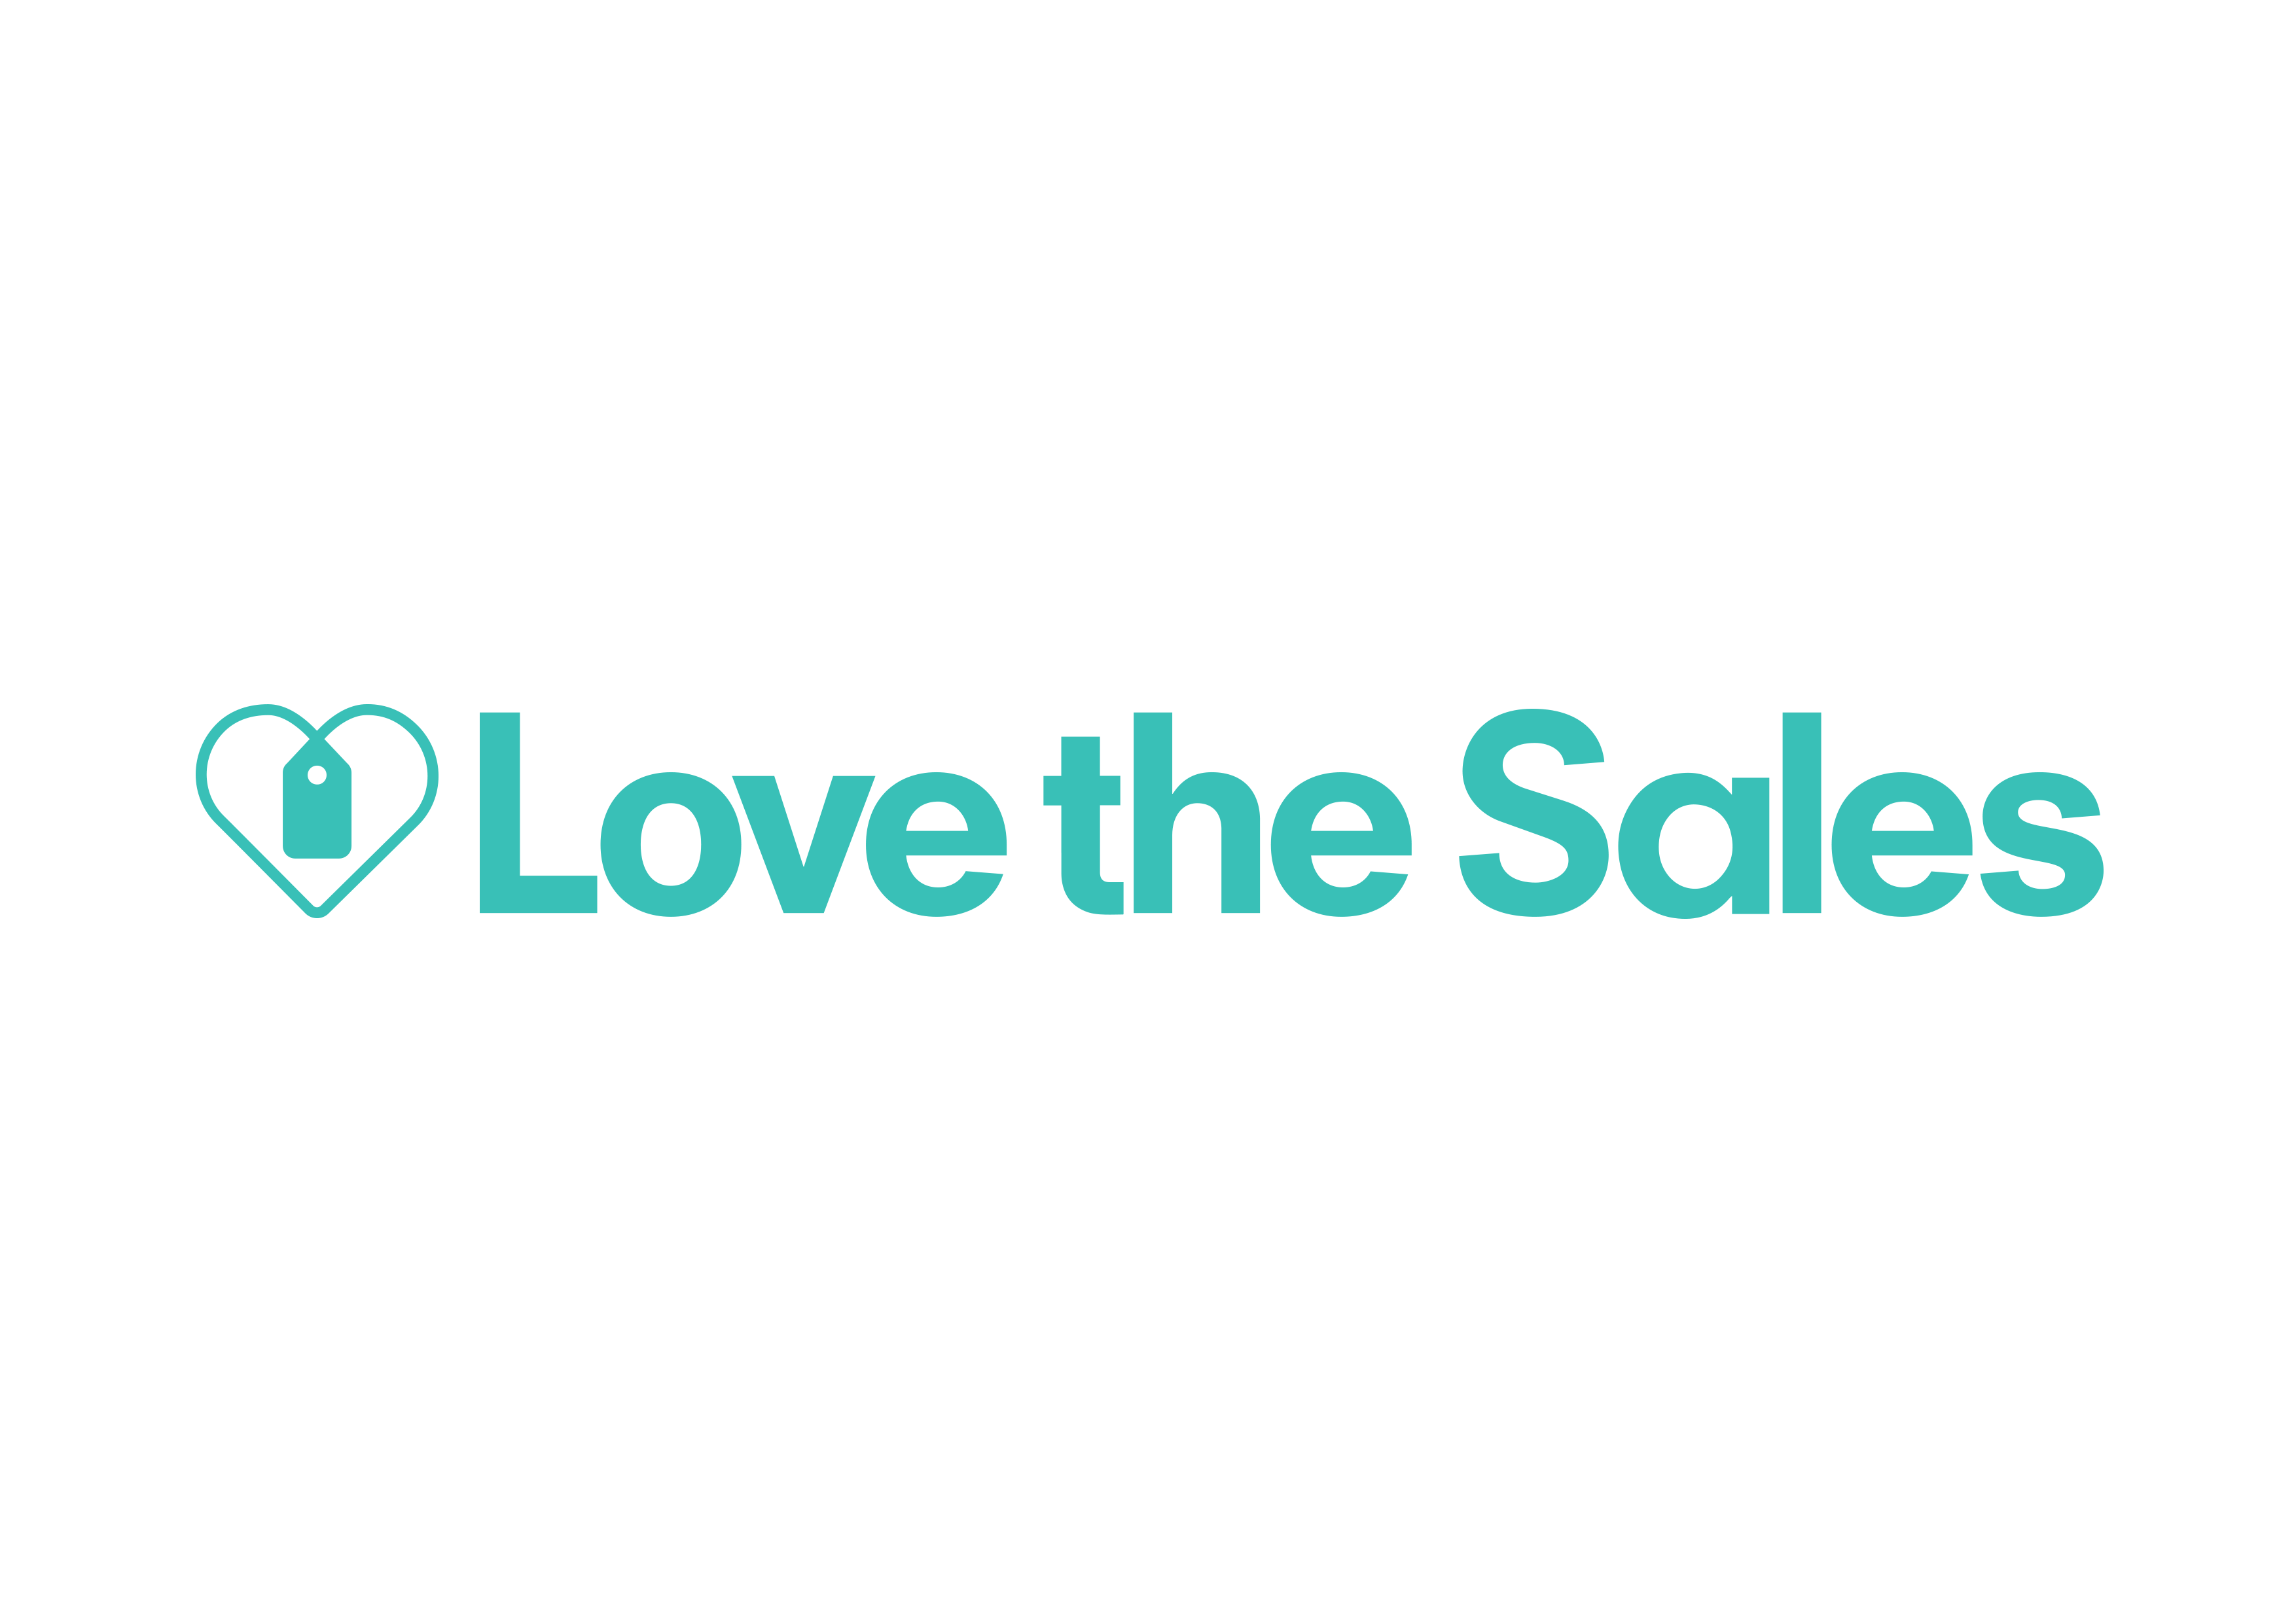 Love the Sales company logo